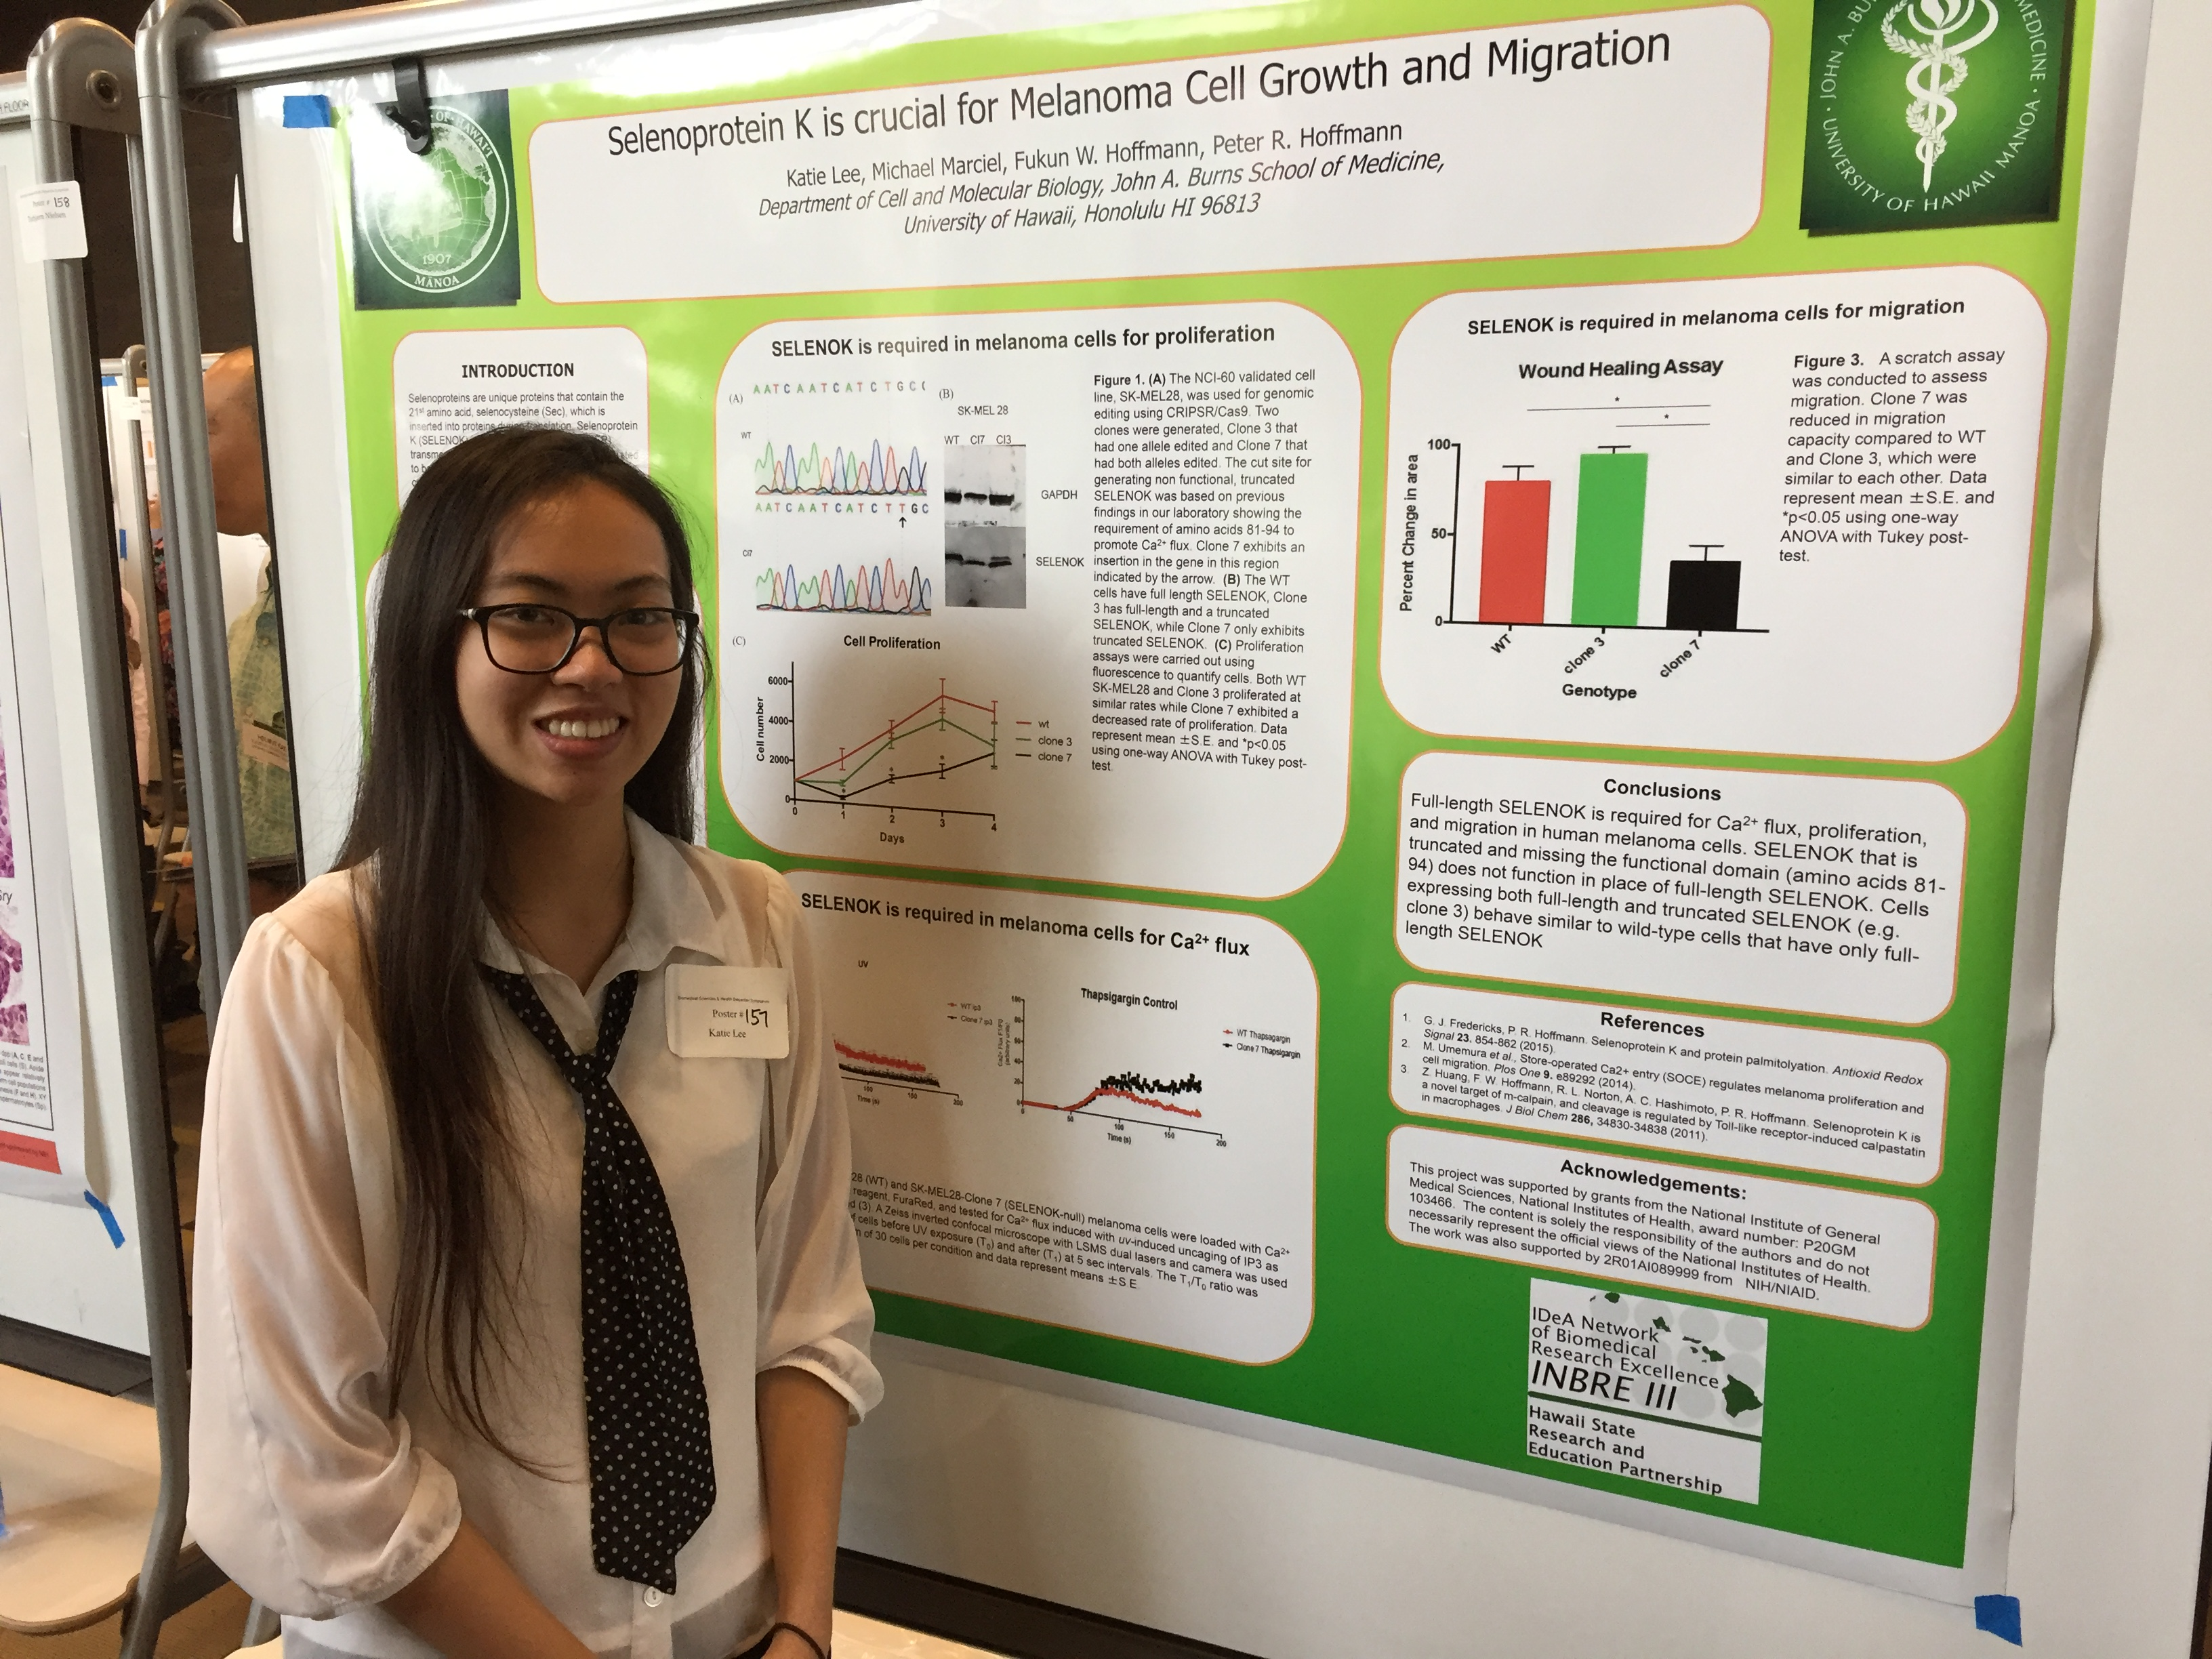 INBRE SRE Student, Katie Lee, at the Undergraduate Poster Session